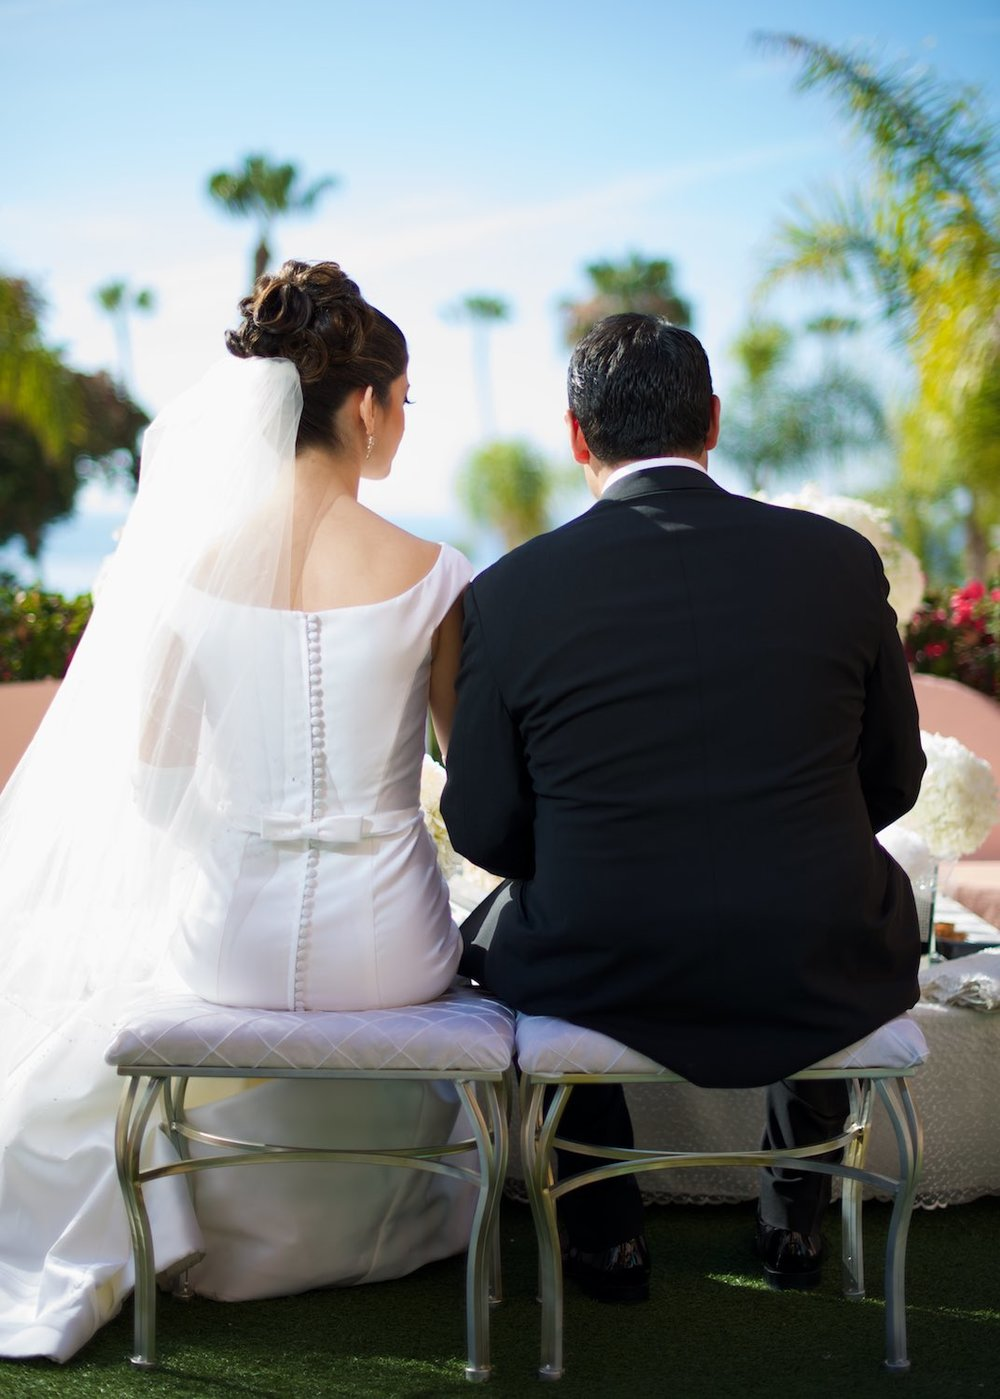 la-valencia-wedding-michal-pfeil-27.jpg